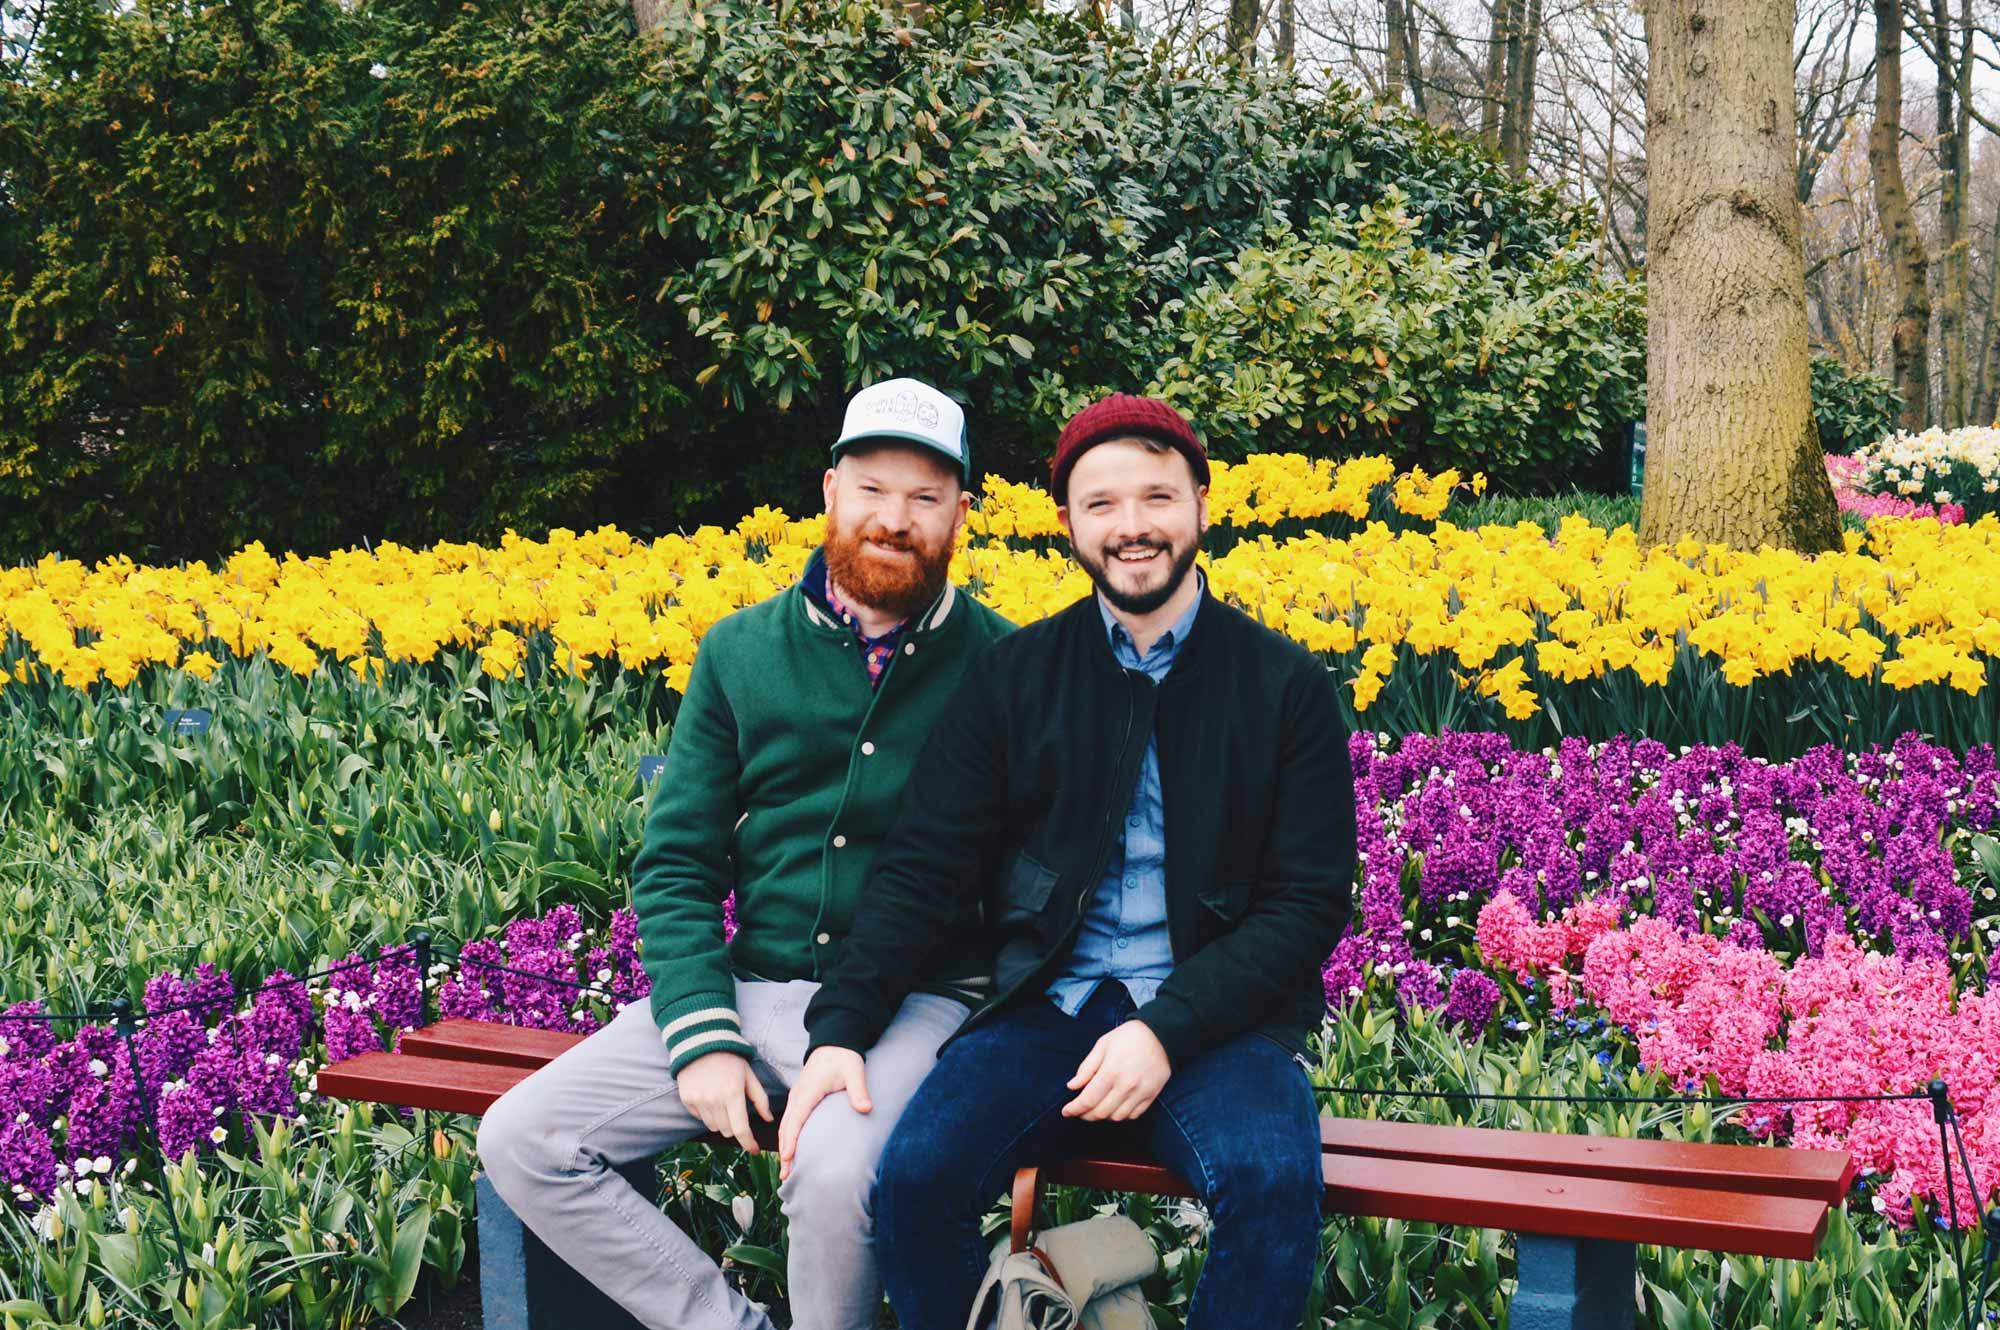 Two men in love with nature   Keukenhof Tulip Blossom Holland © Coupleofmen.com